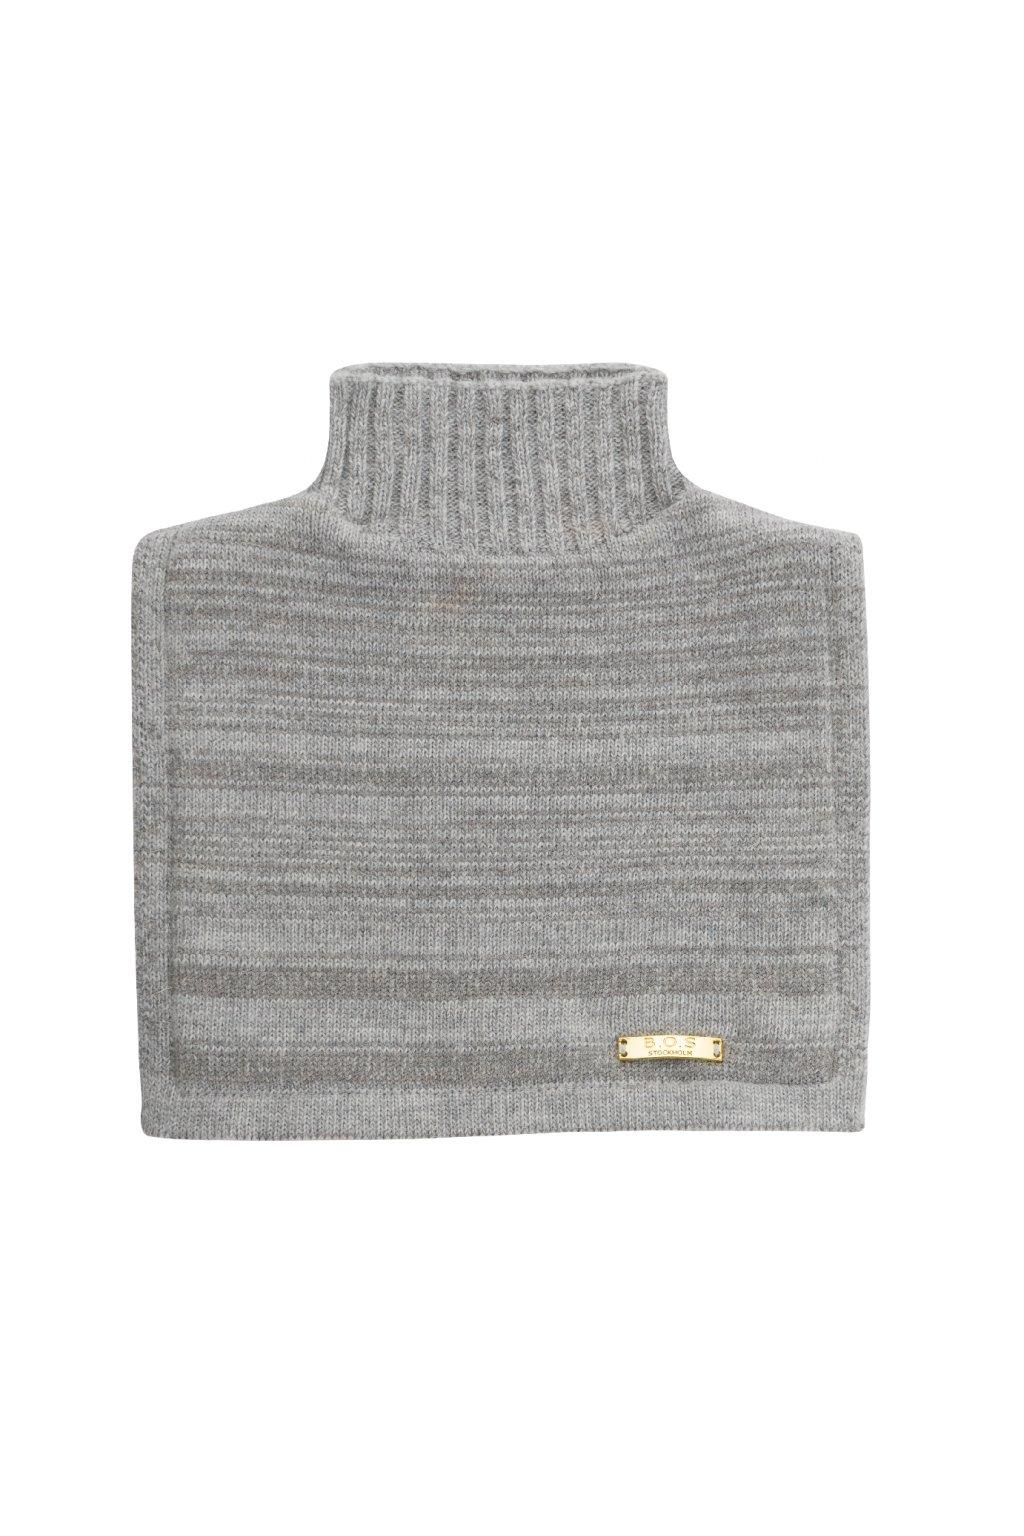 Neckwarmer, grey